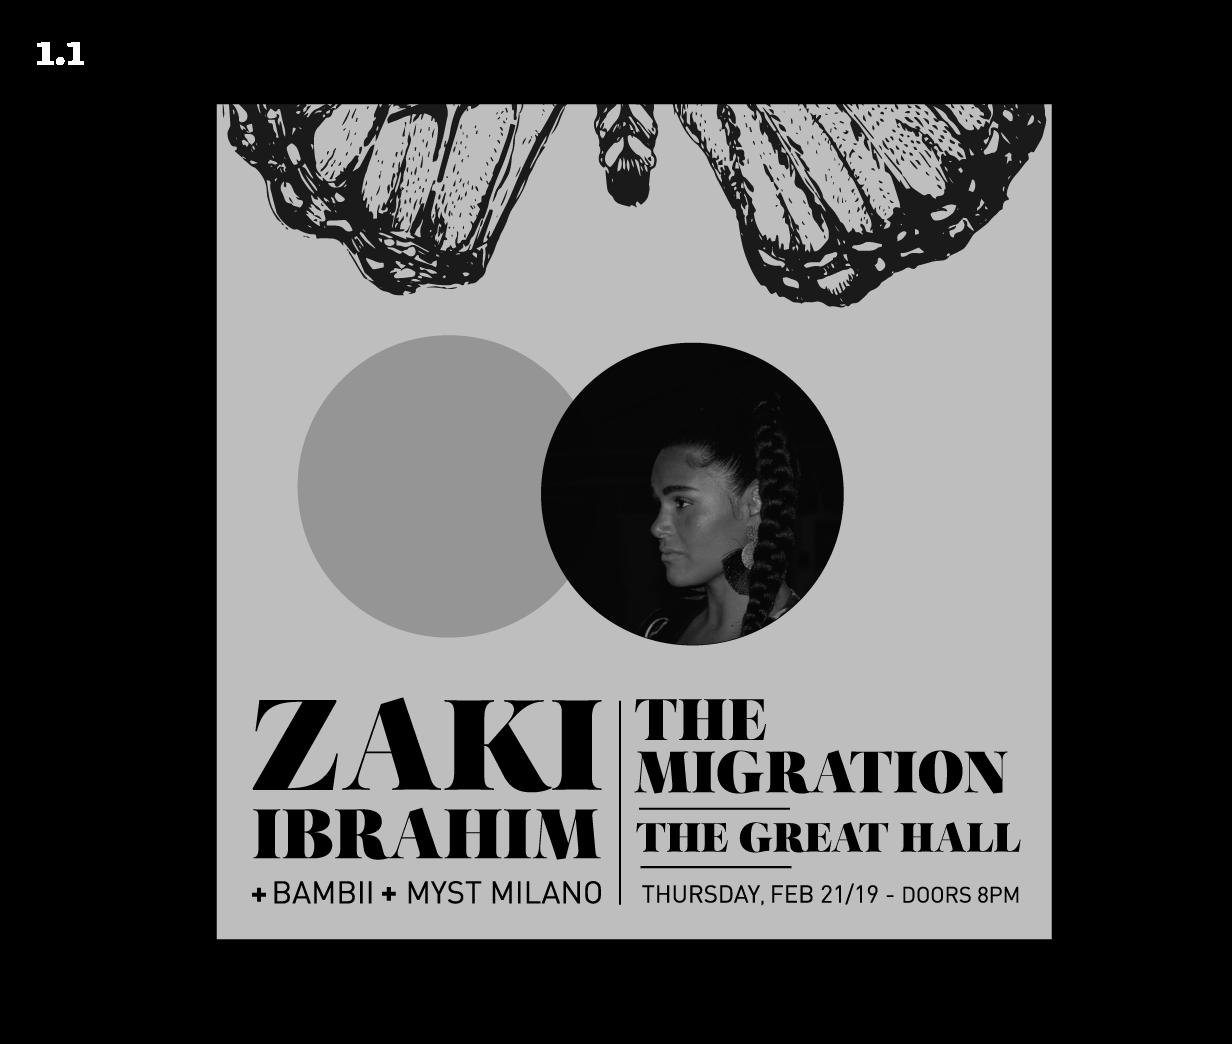 zaki2.png